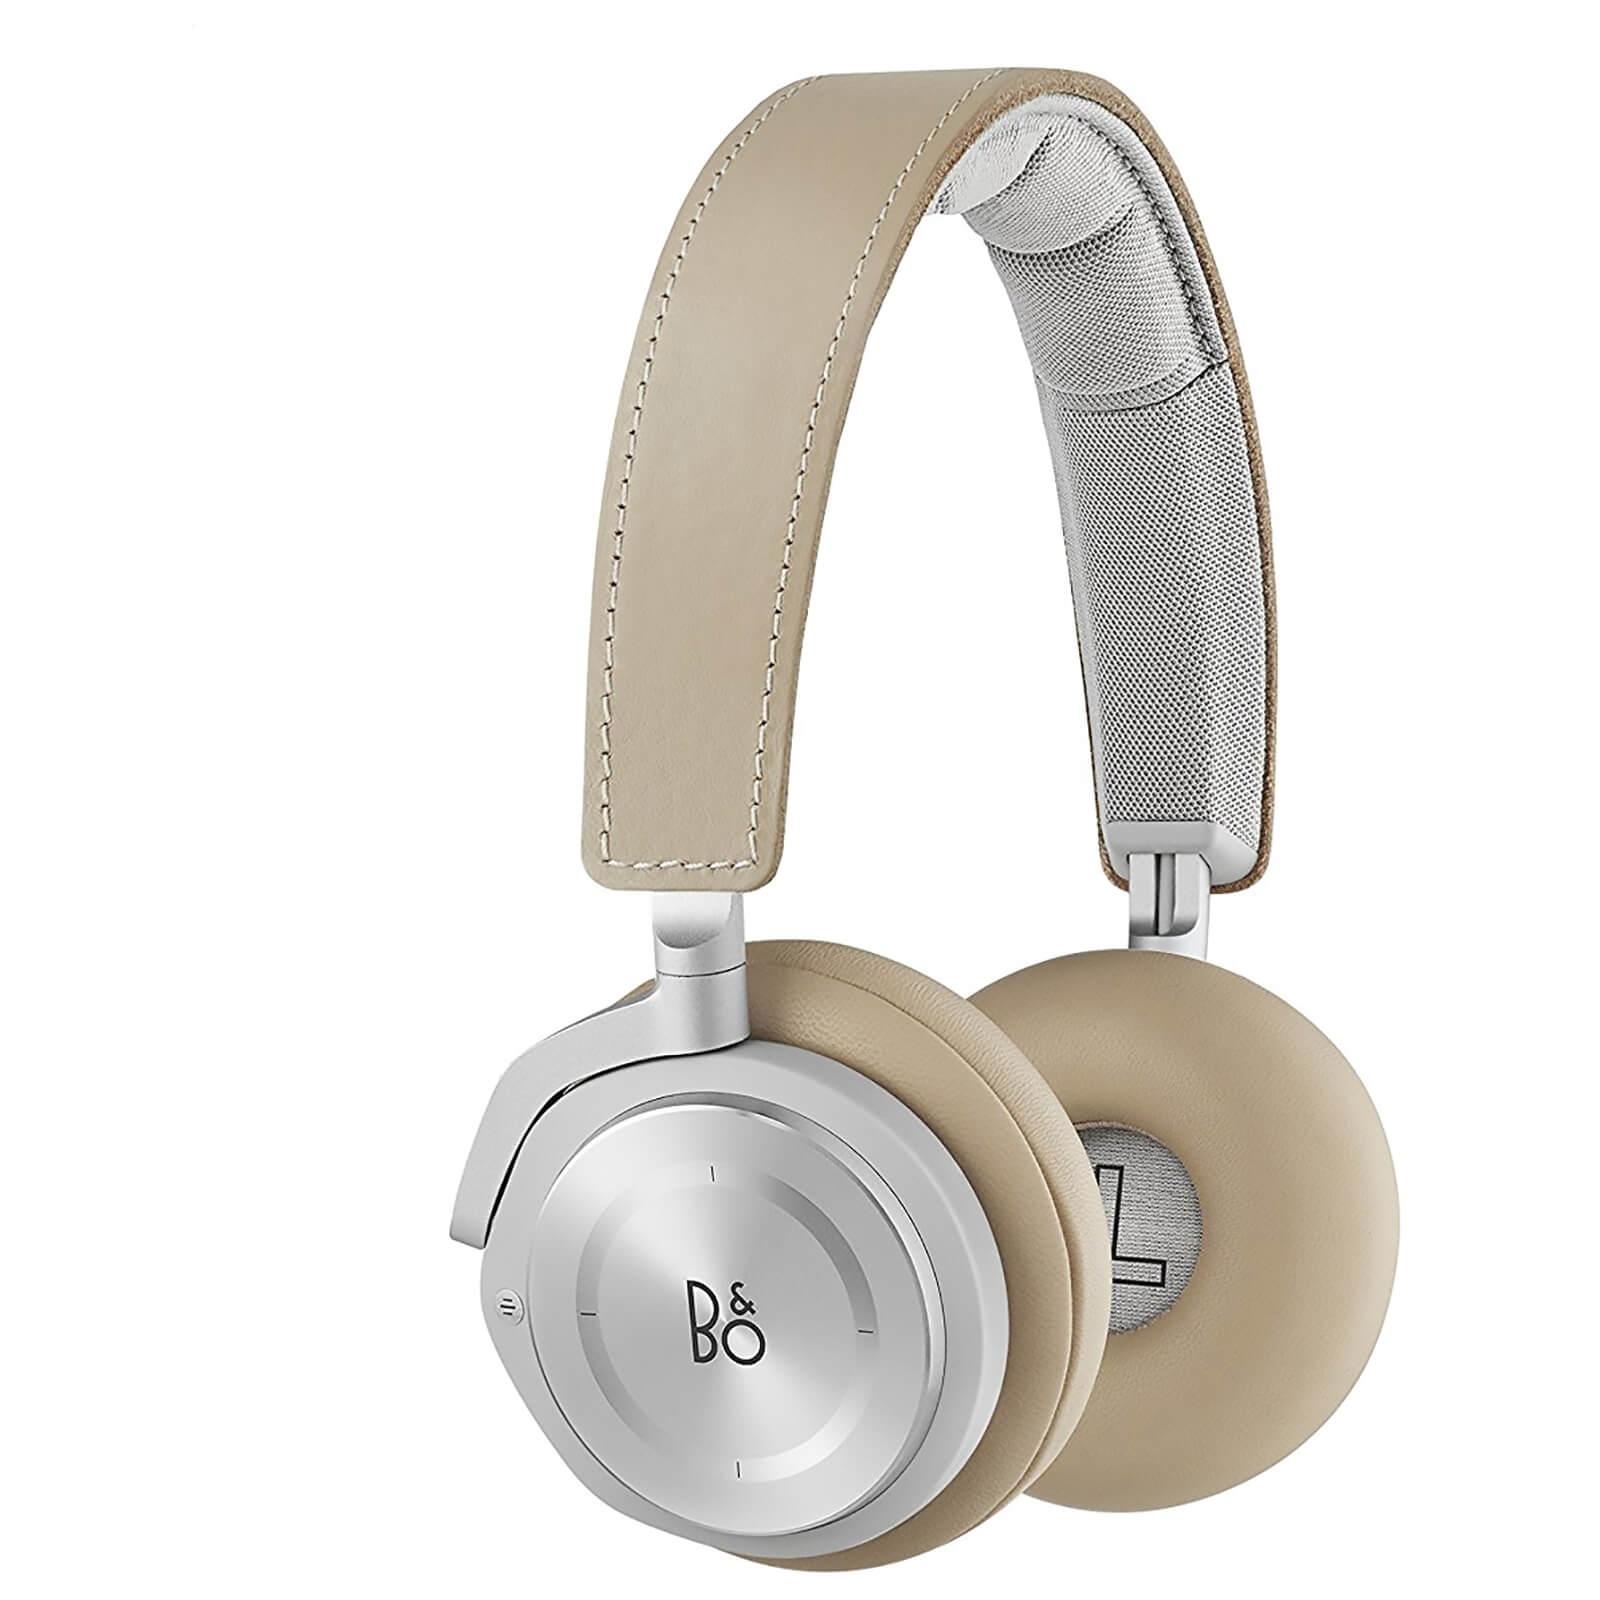 Casque sans fil Bang & Olufsen BeoPlay H8 Wireless